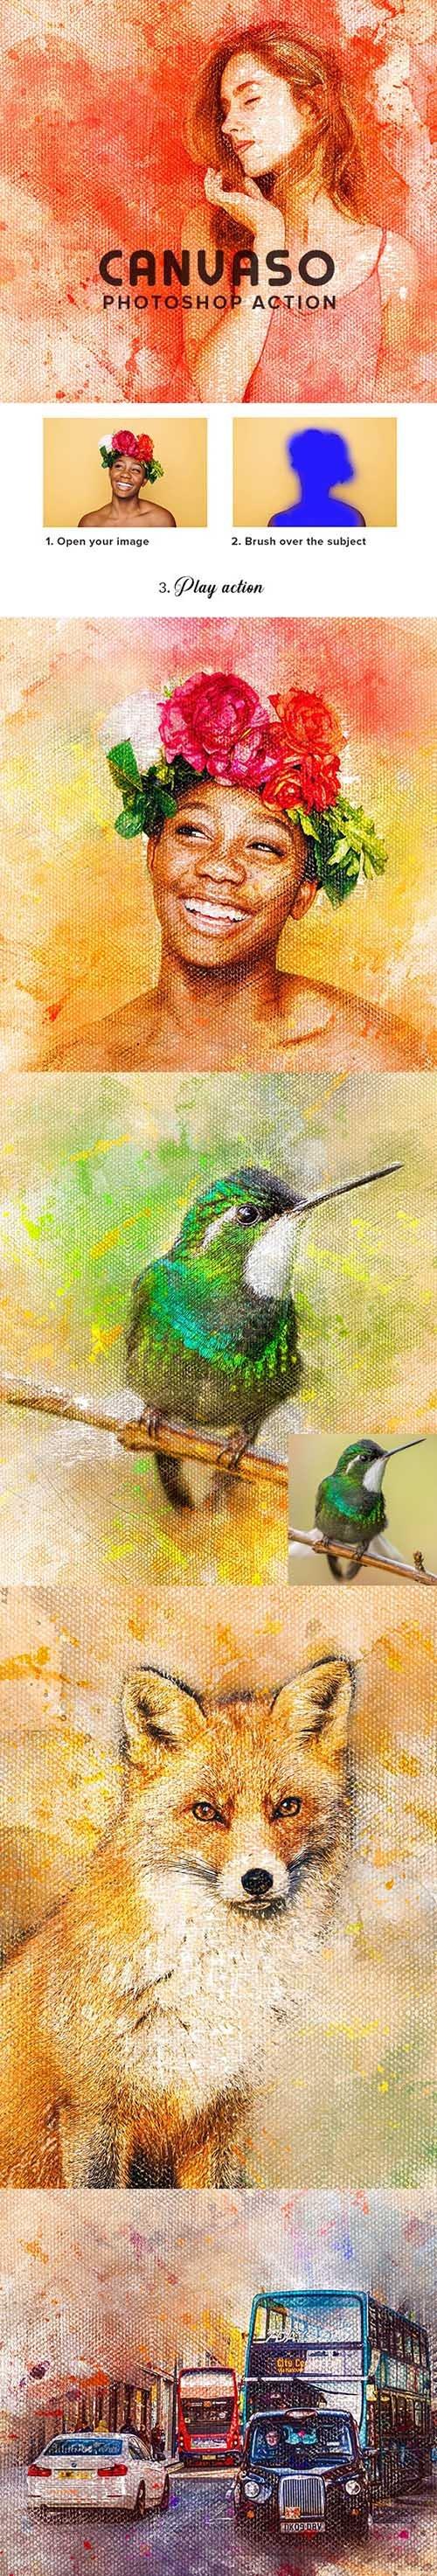 Canvaso Photoshop Action 25596185